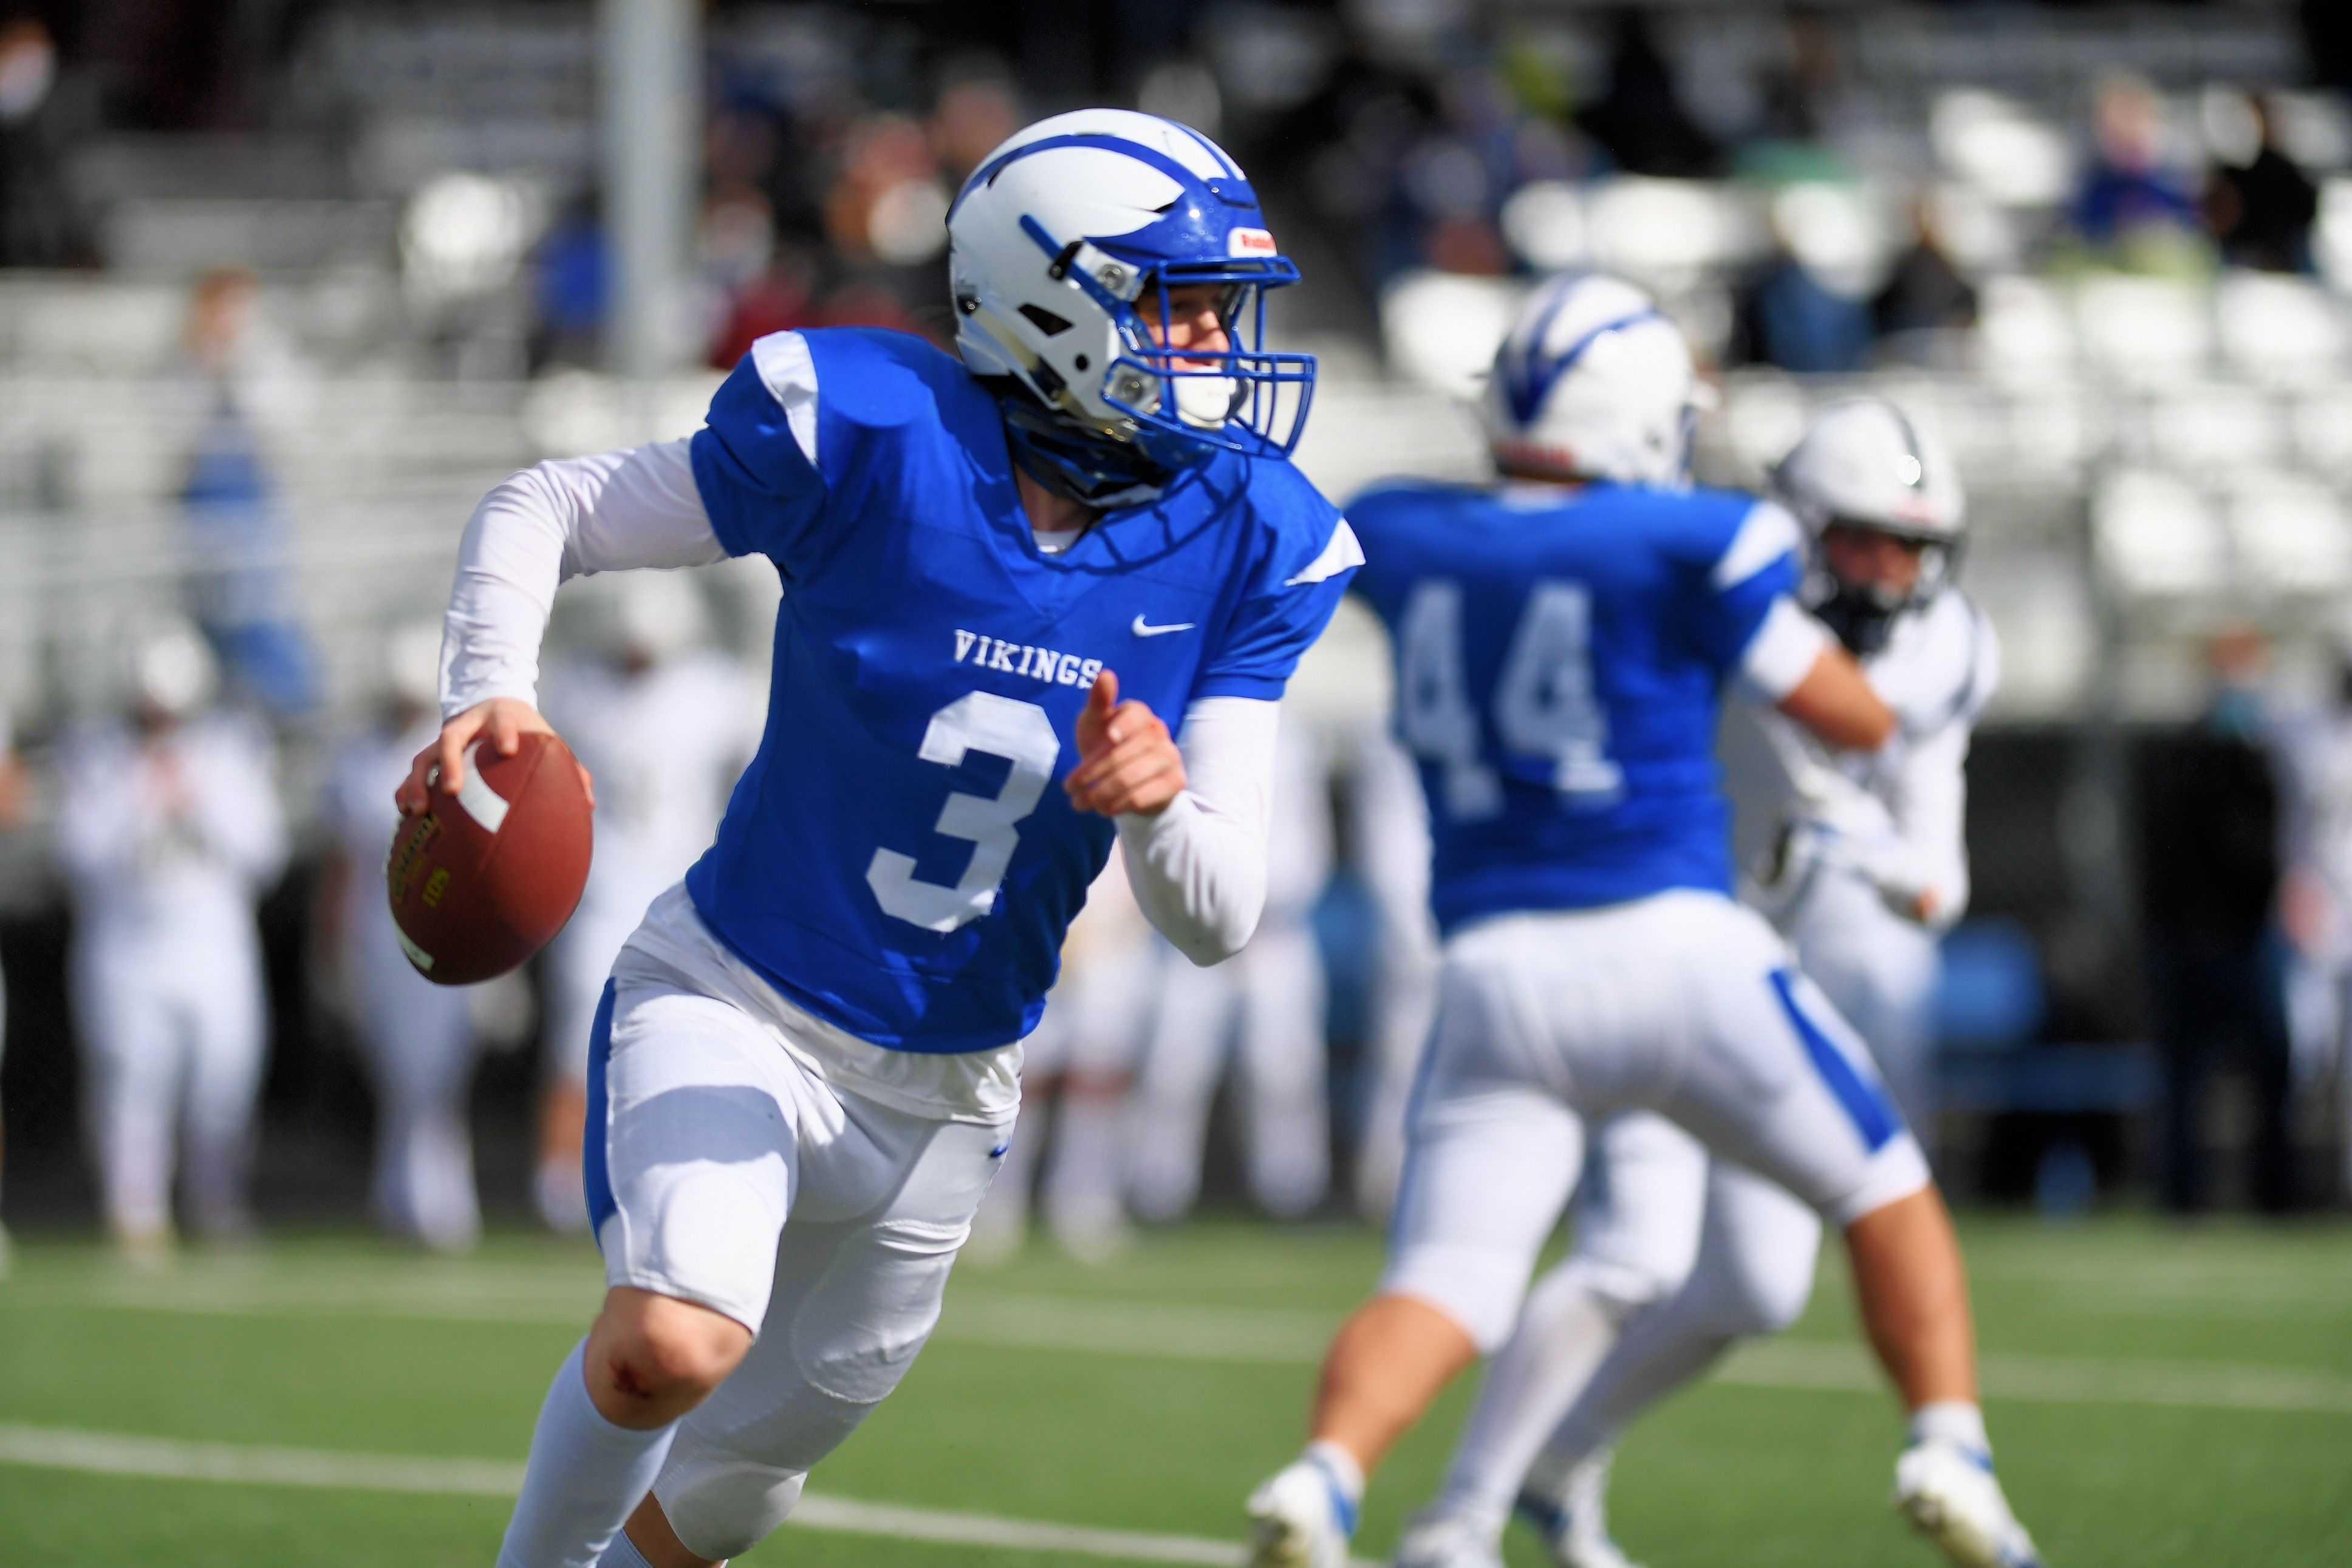 Mazama's Tristan Lee, a 6-3 senior, is having a big season at quarterback and in the secondary. (Leon Neuschwander/SBLive)